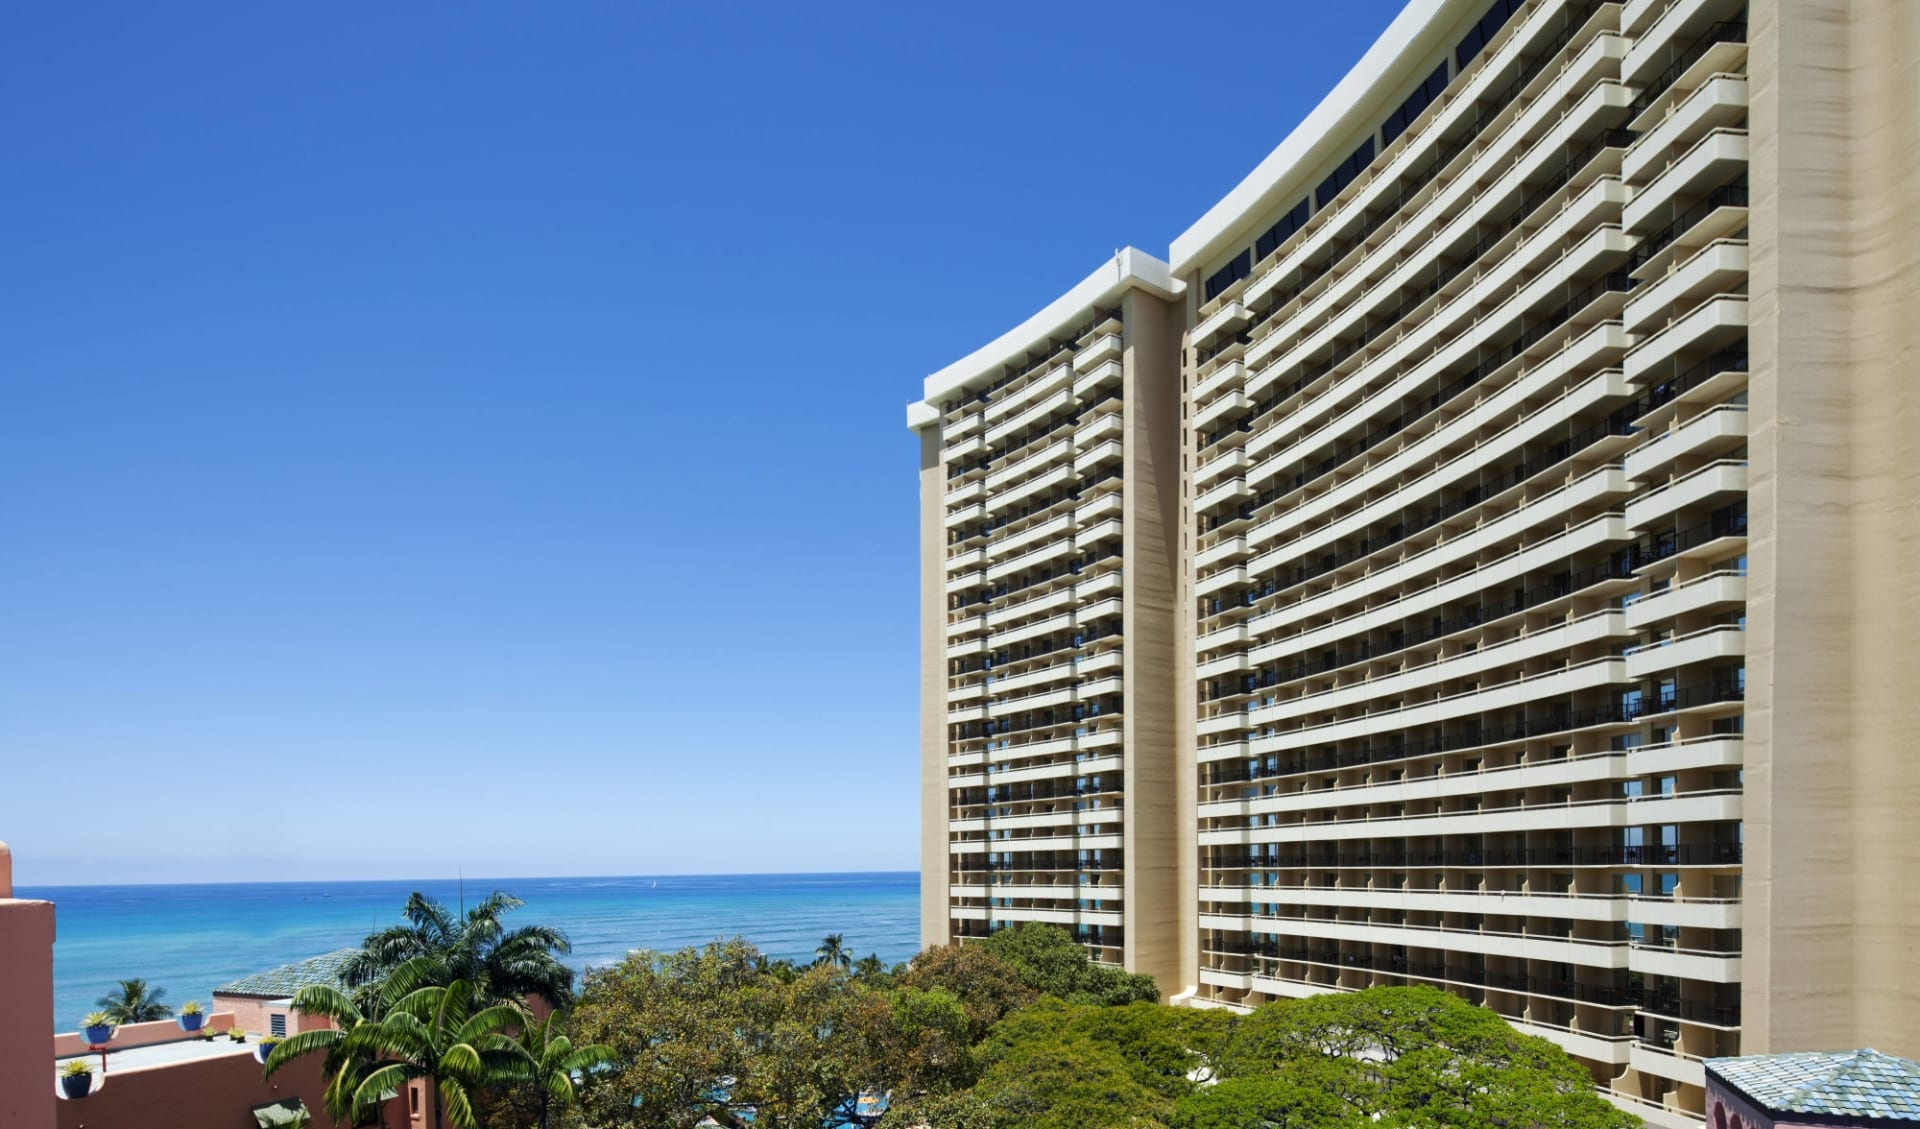 Sheraton Waikiki in Honolulu - Oahu: Exterior_Sheraton Waikiki_Aussenansicht bei Tag_ATI